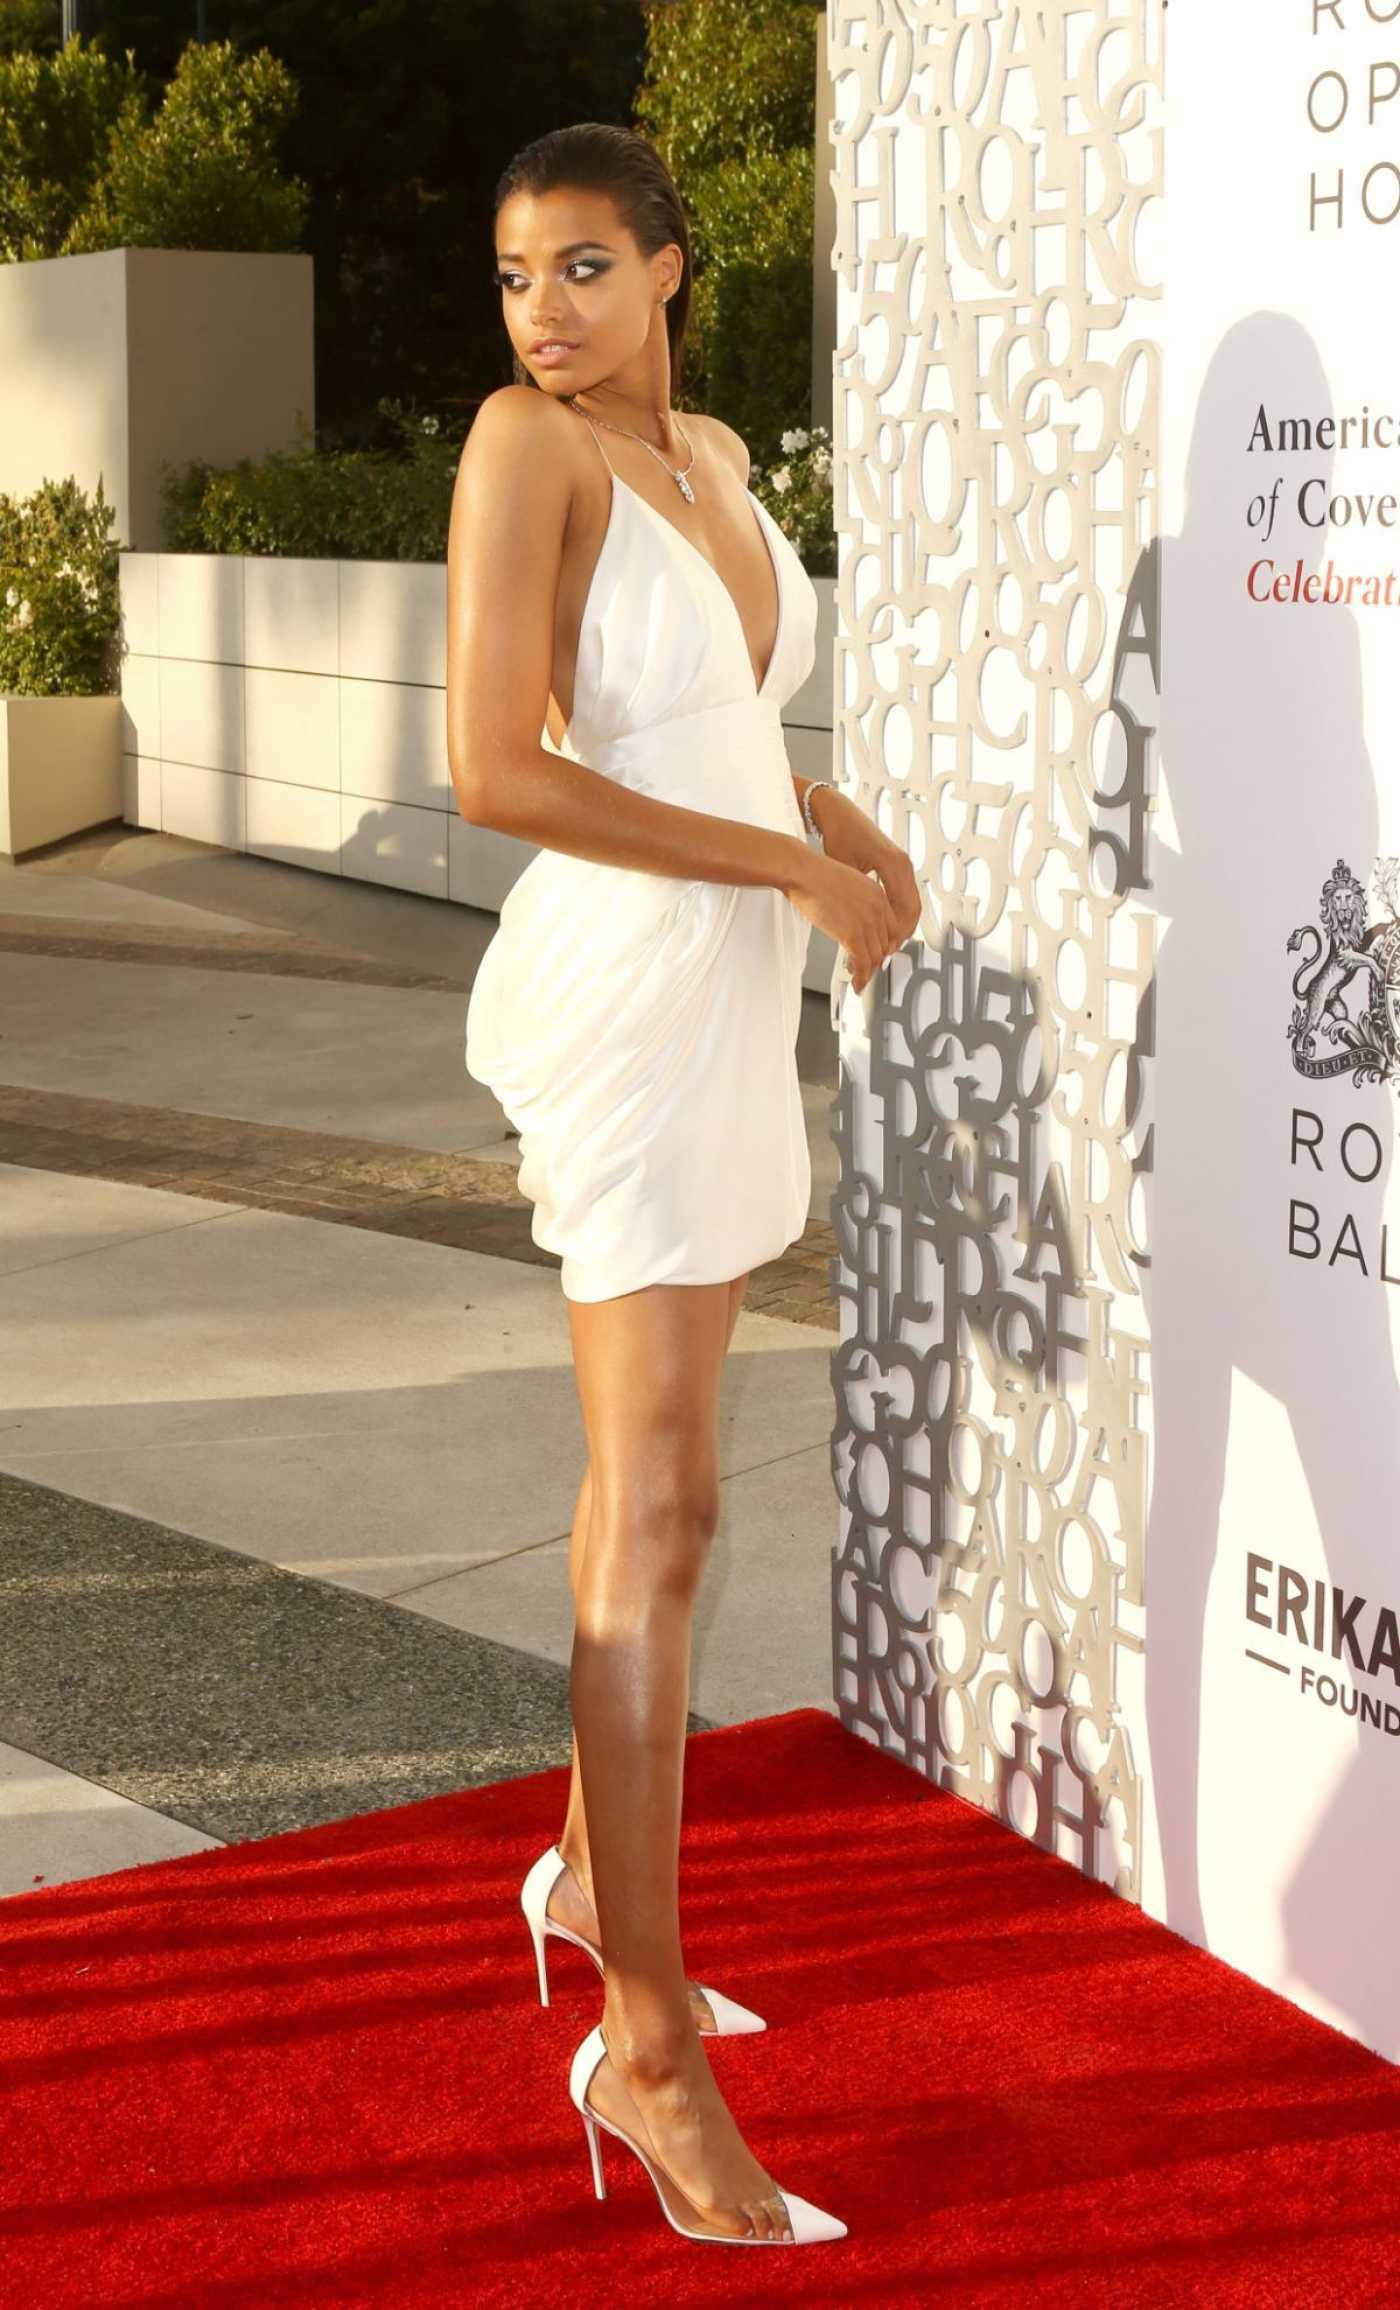 Ella Balinska Attends Afocg 50th Anniversary Celebration in Beverly Hills 07/10/2019